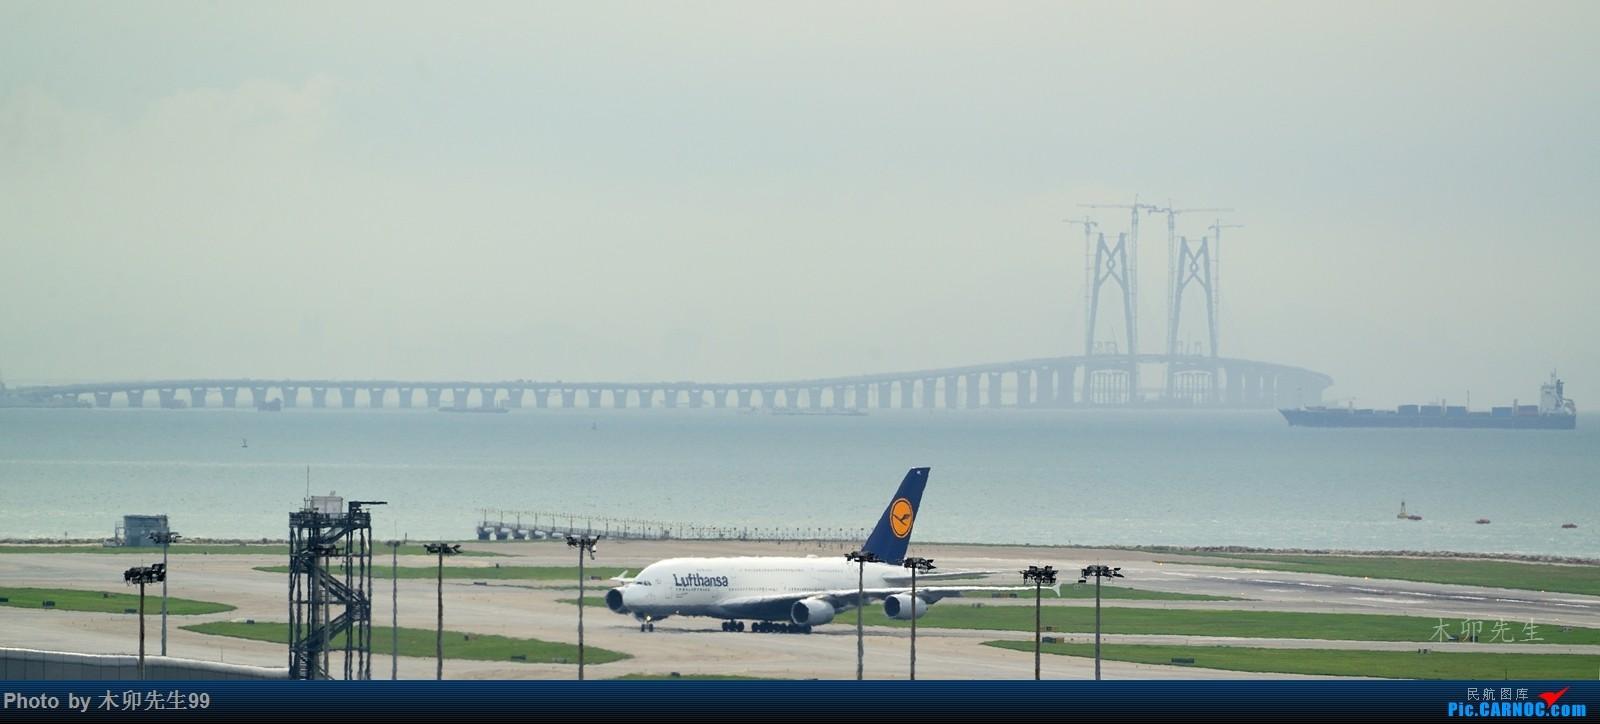 Re:[原创]【木卯先生99】—【2016年香港拍机新发现】—2016 AIRBUS A380-800 D-AIMK 香港赤鱲角国际机场